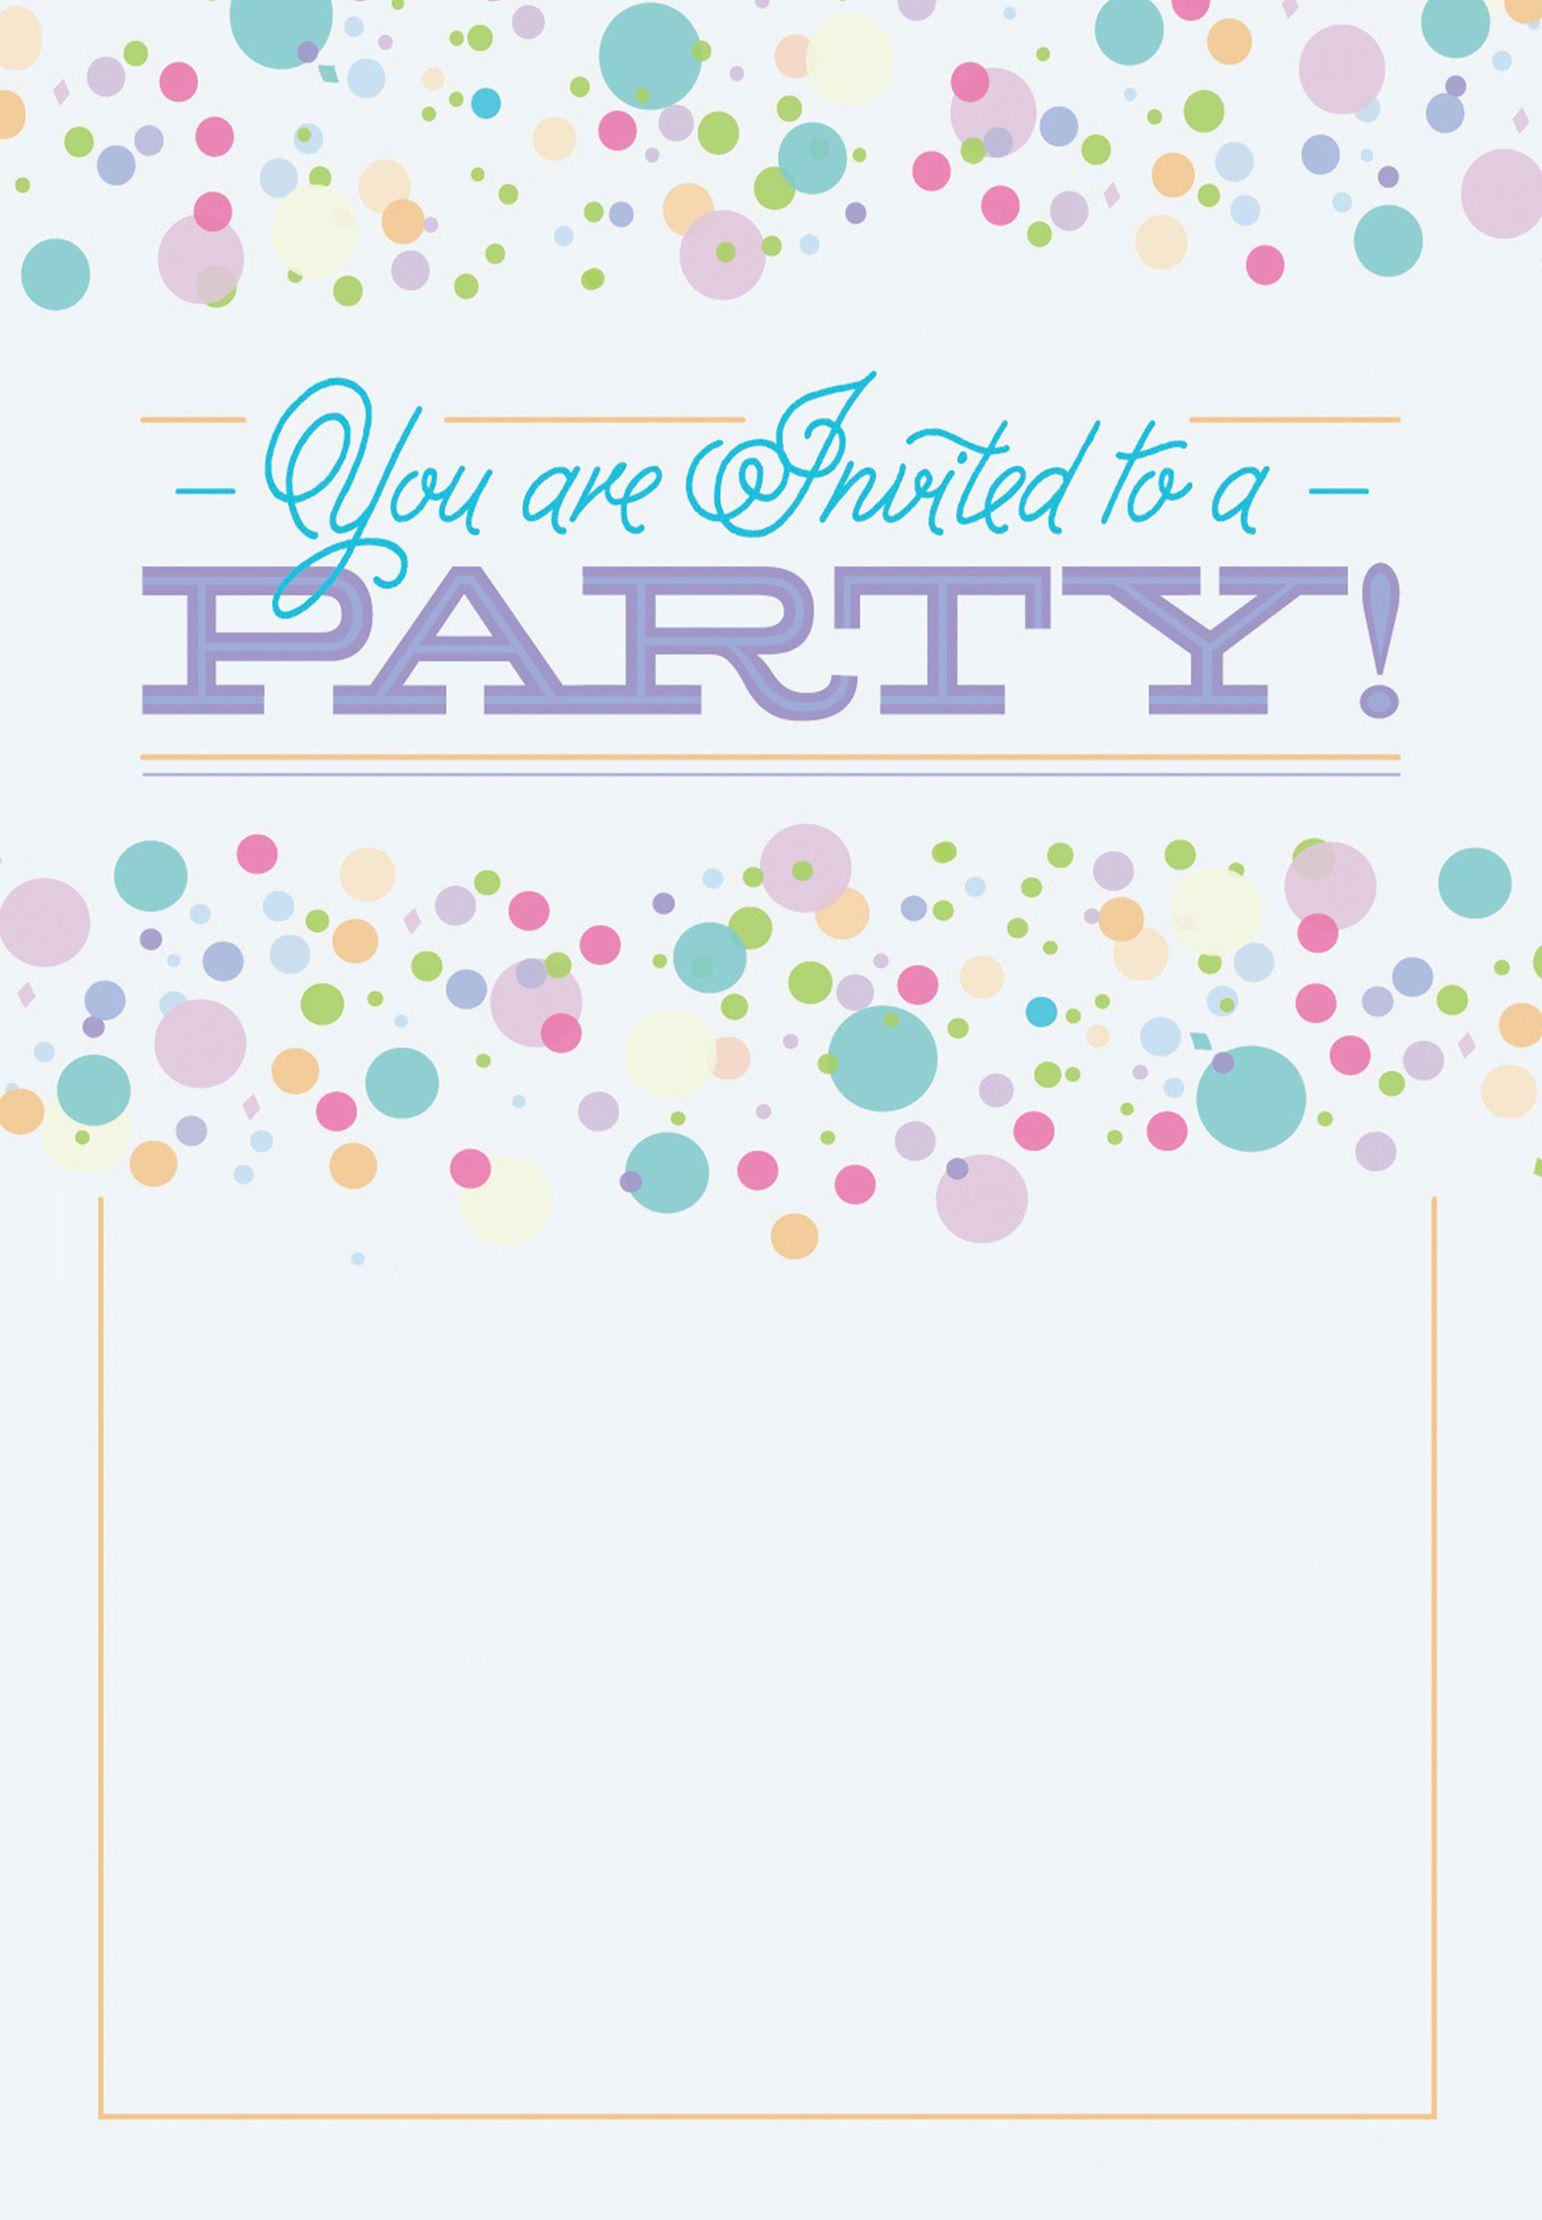 007 Wondrou Party Invite Template Free Example  Ugly Sweater Invitation Word Christma Printable Swimming UkFull